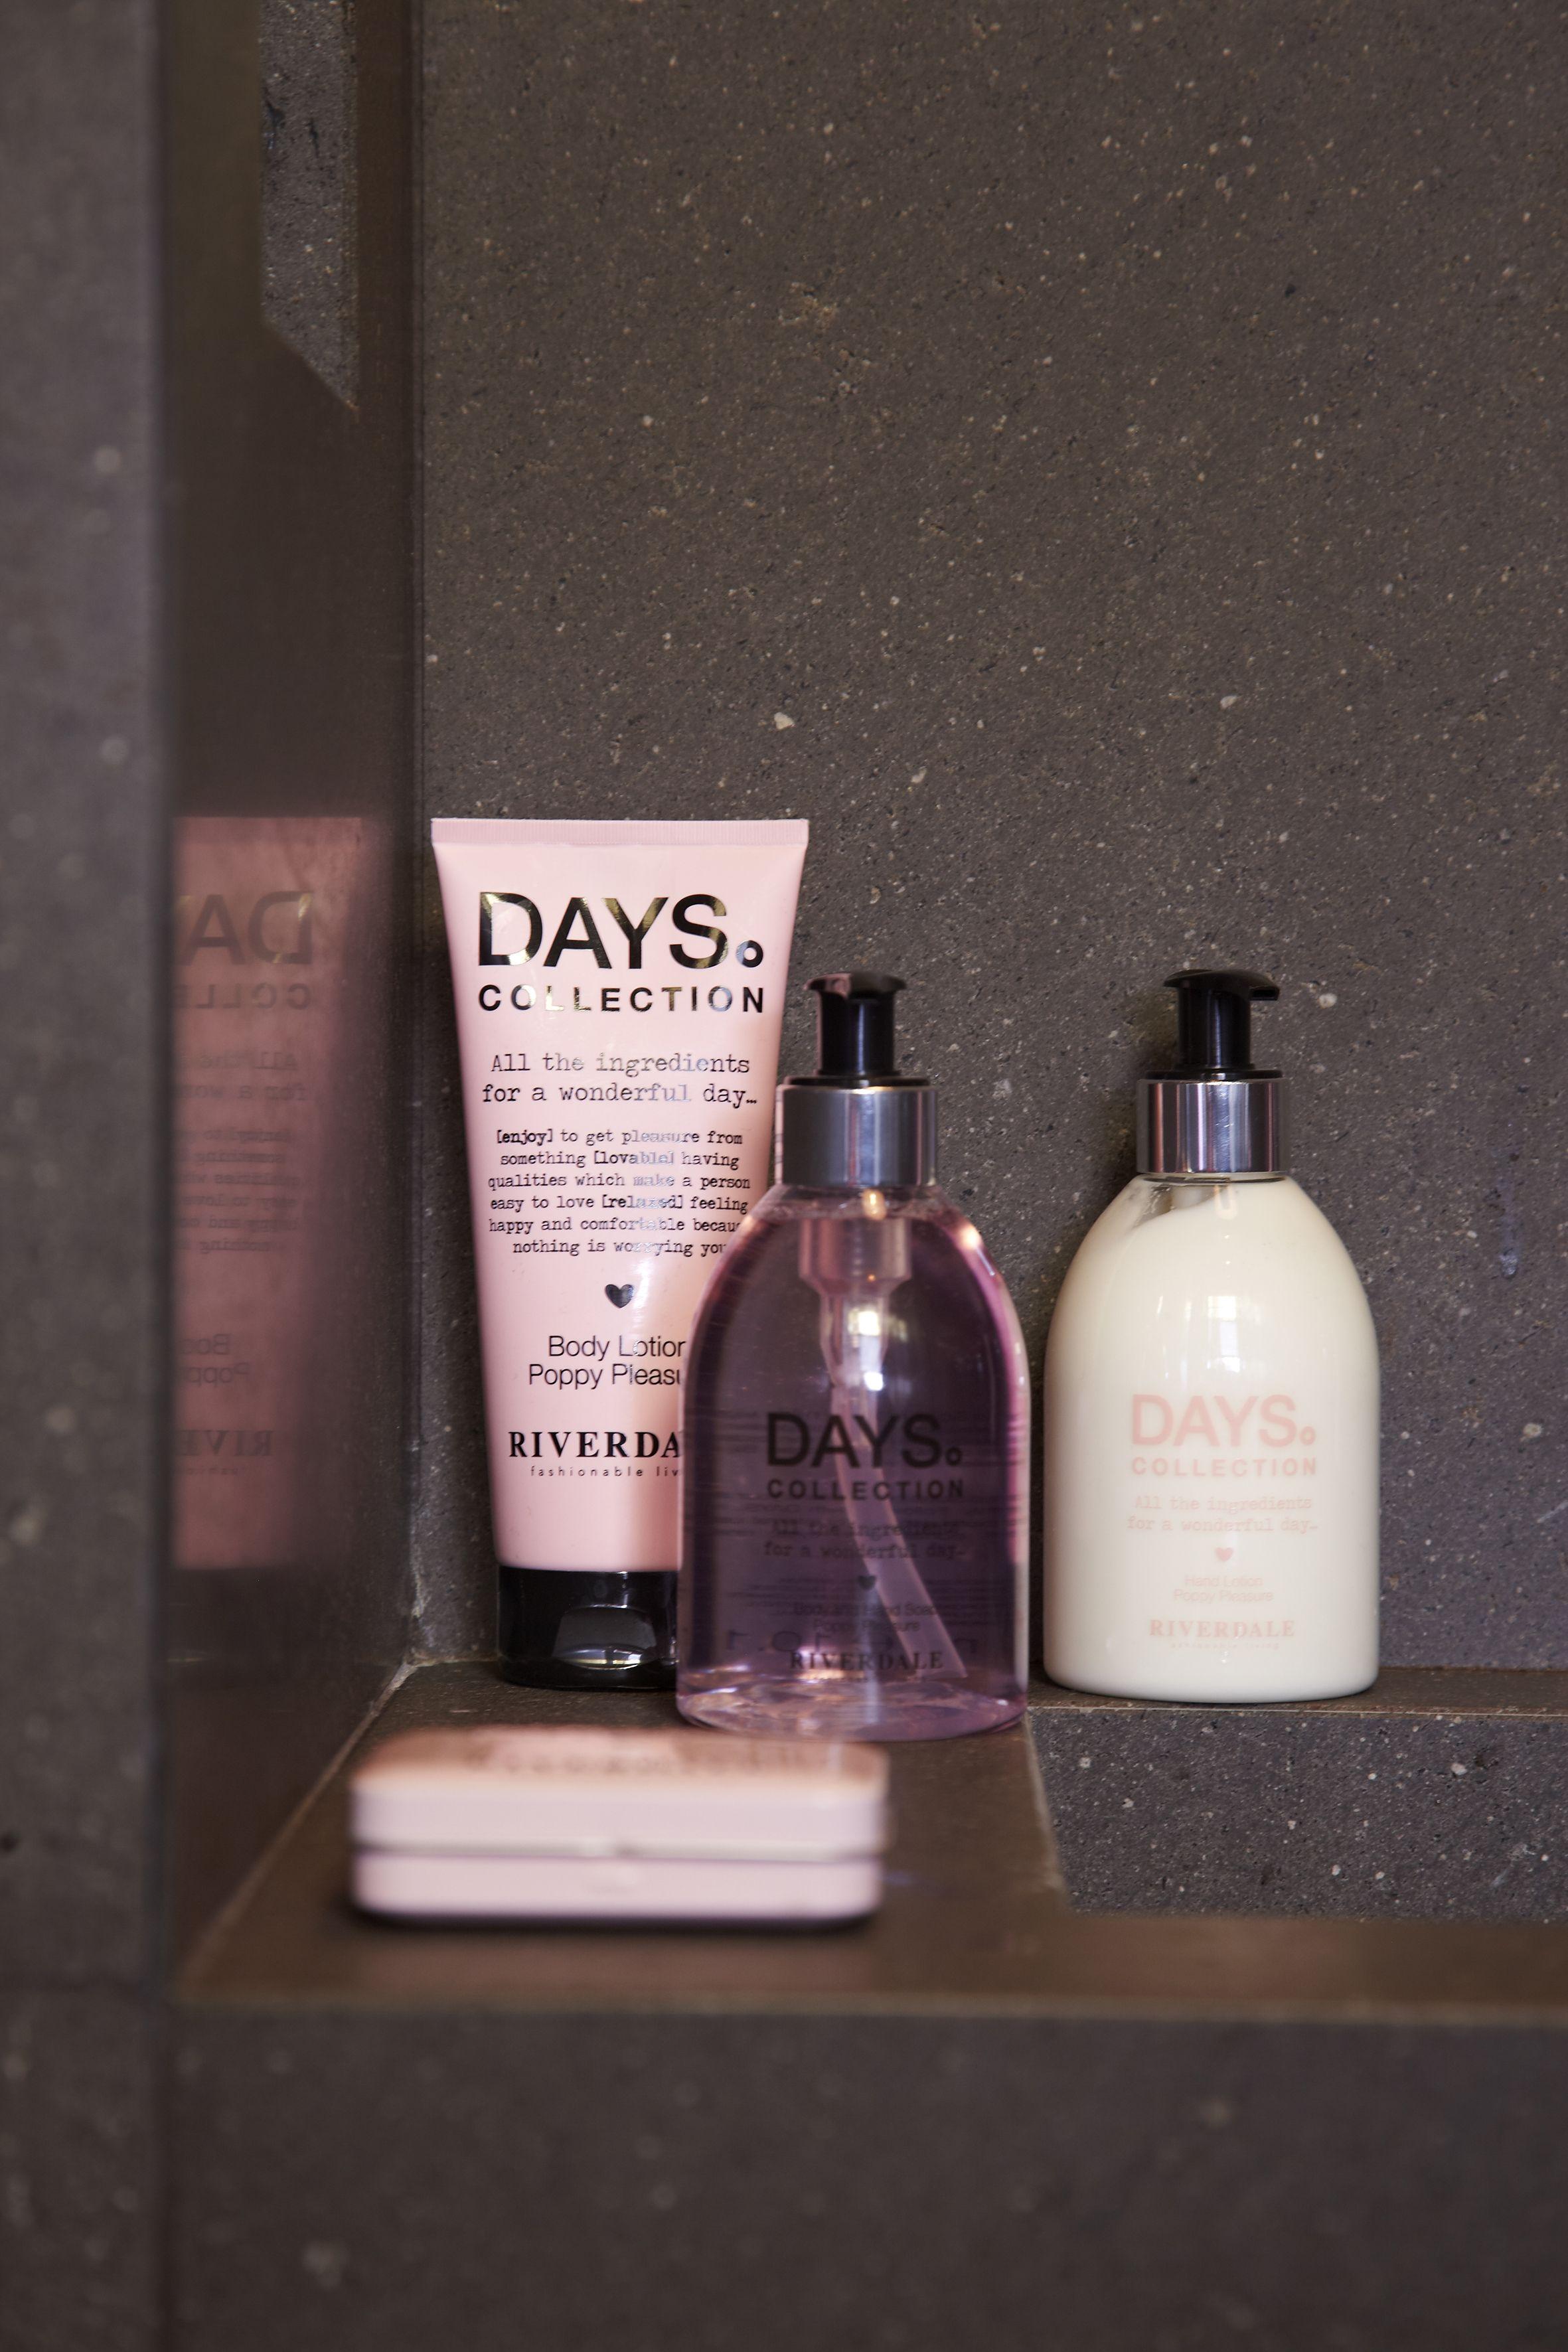 badkamer accesoires van Riverdale   riverdale   Pinterest